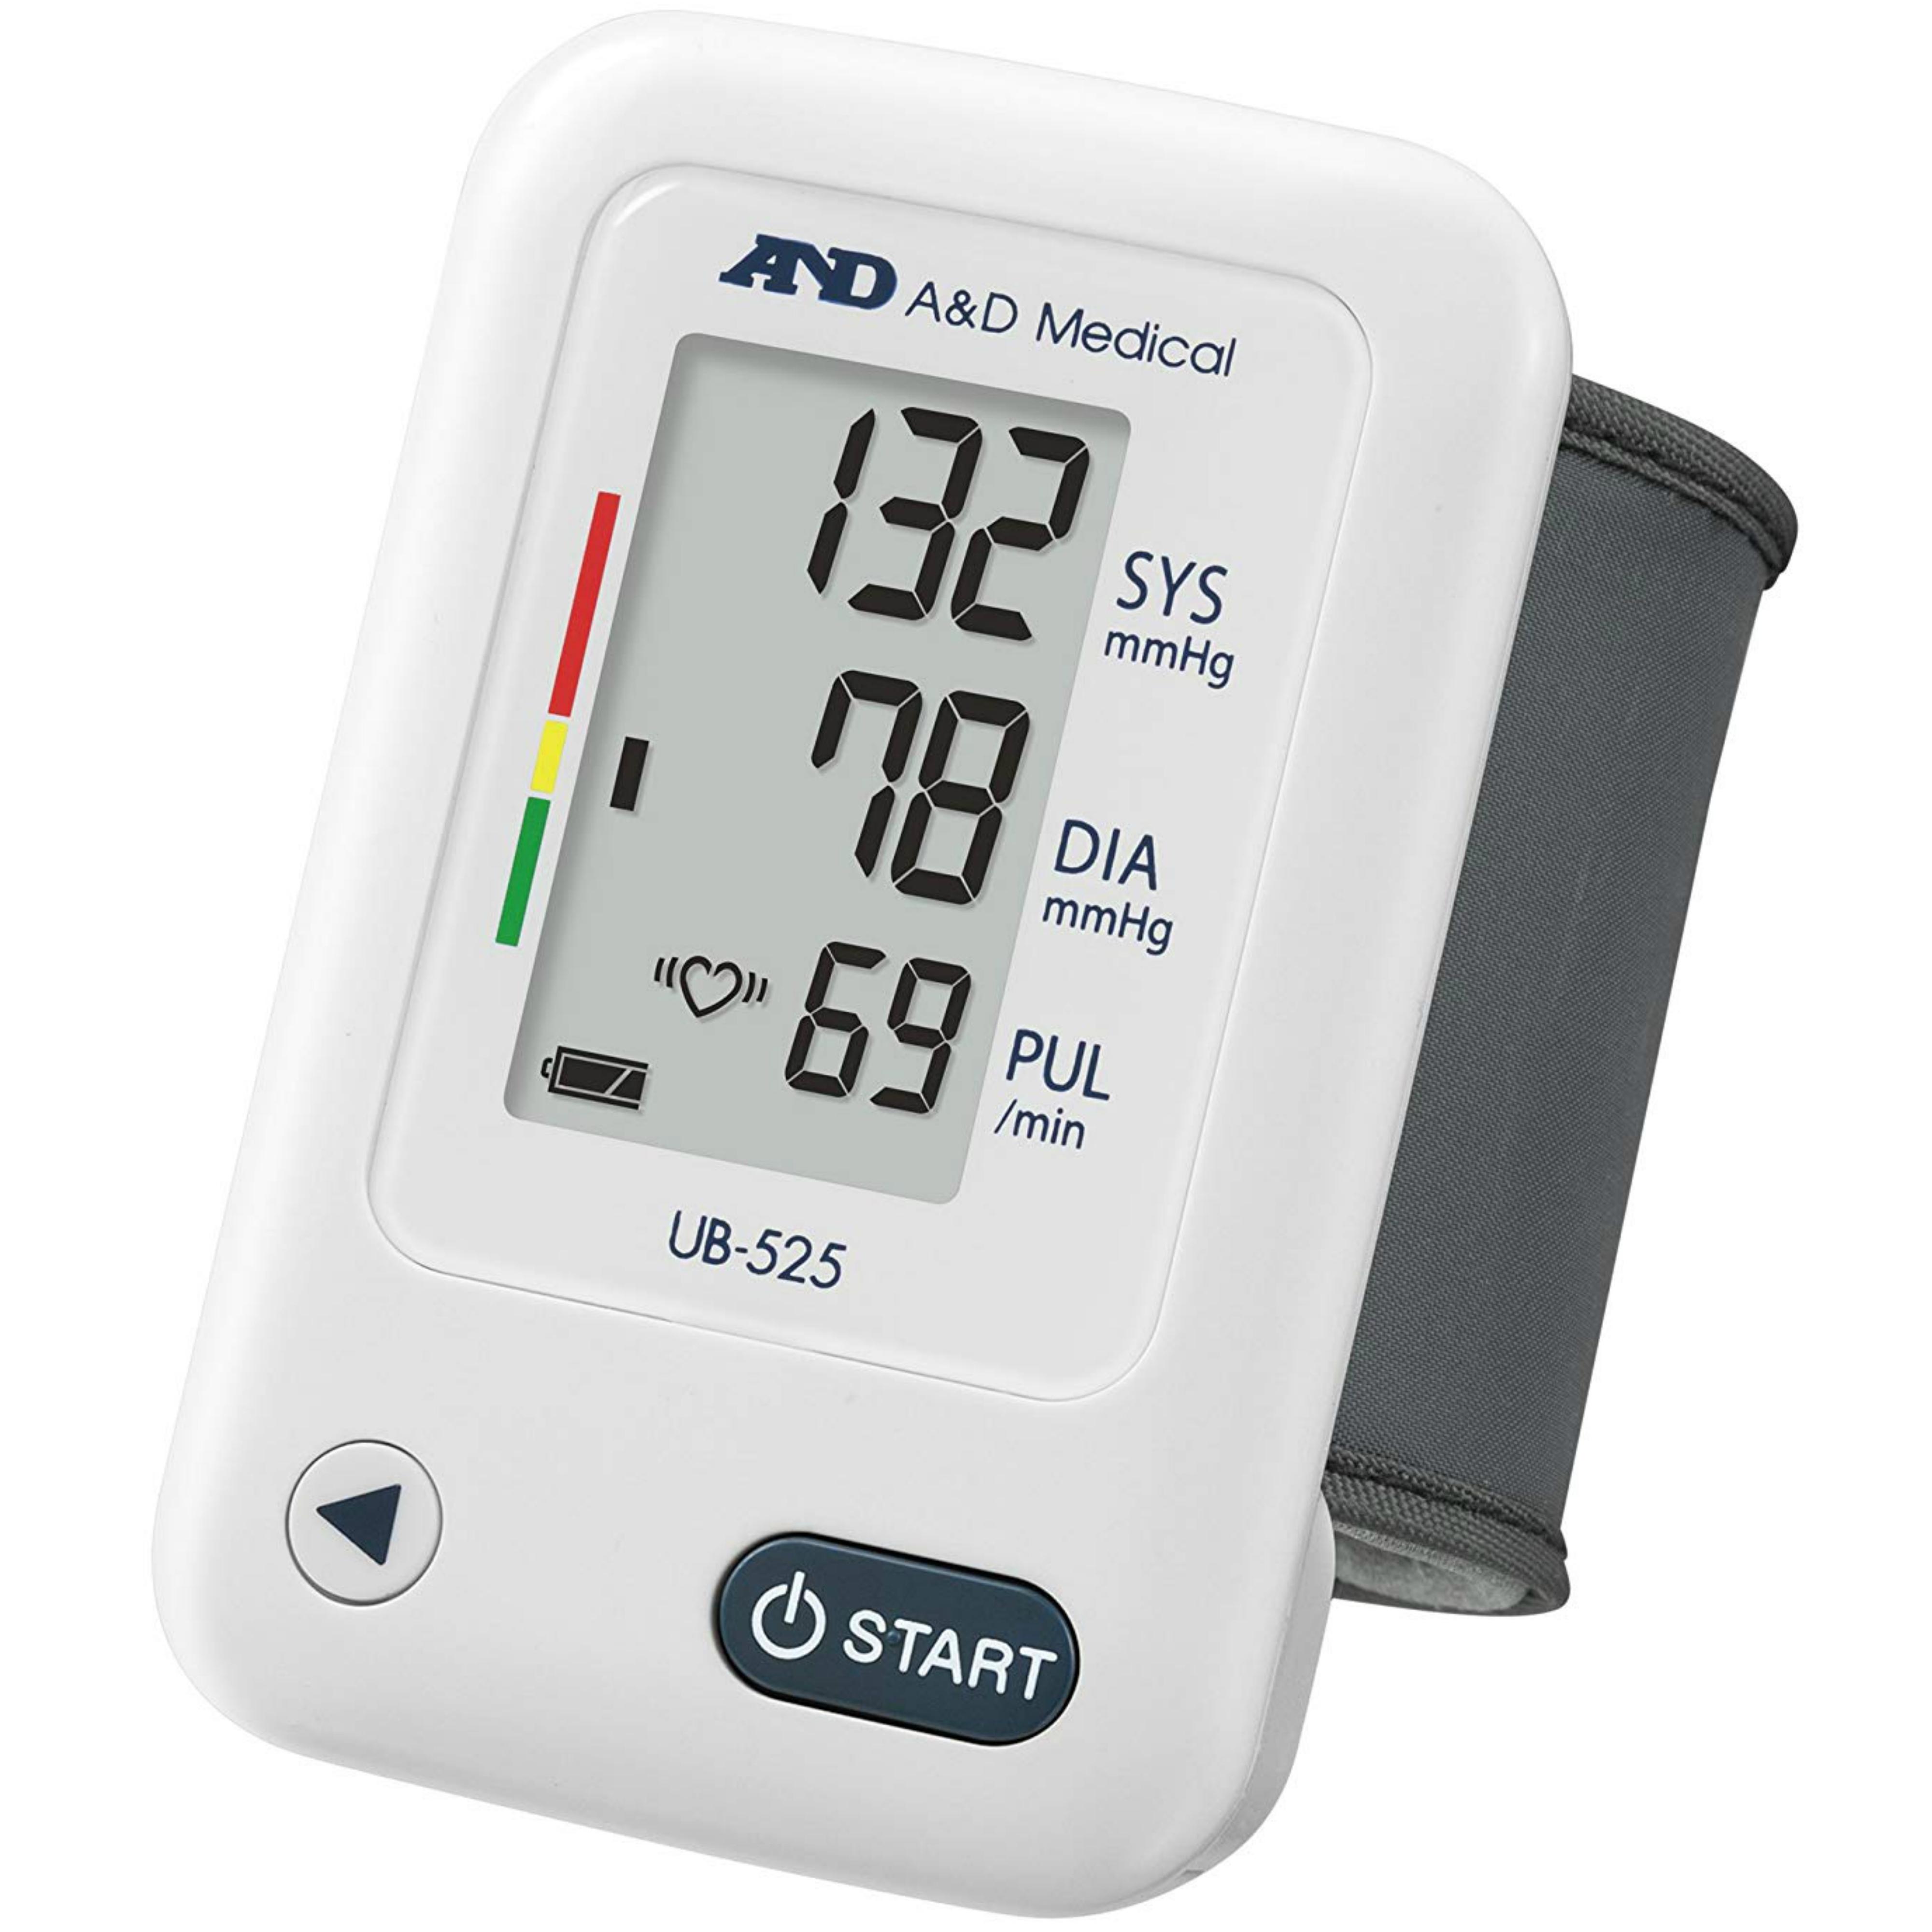 A&D Medical UB-525 Wrist Blood Pressure Monitor | IHB Indicator | Lightweight | White